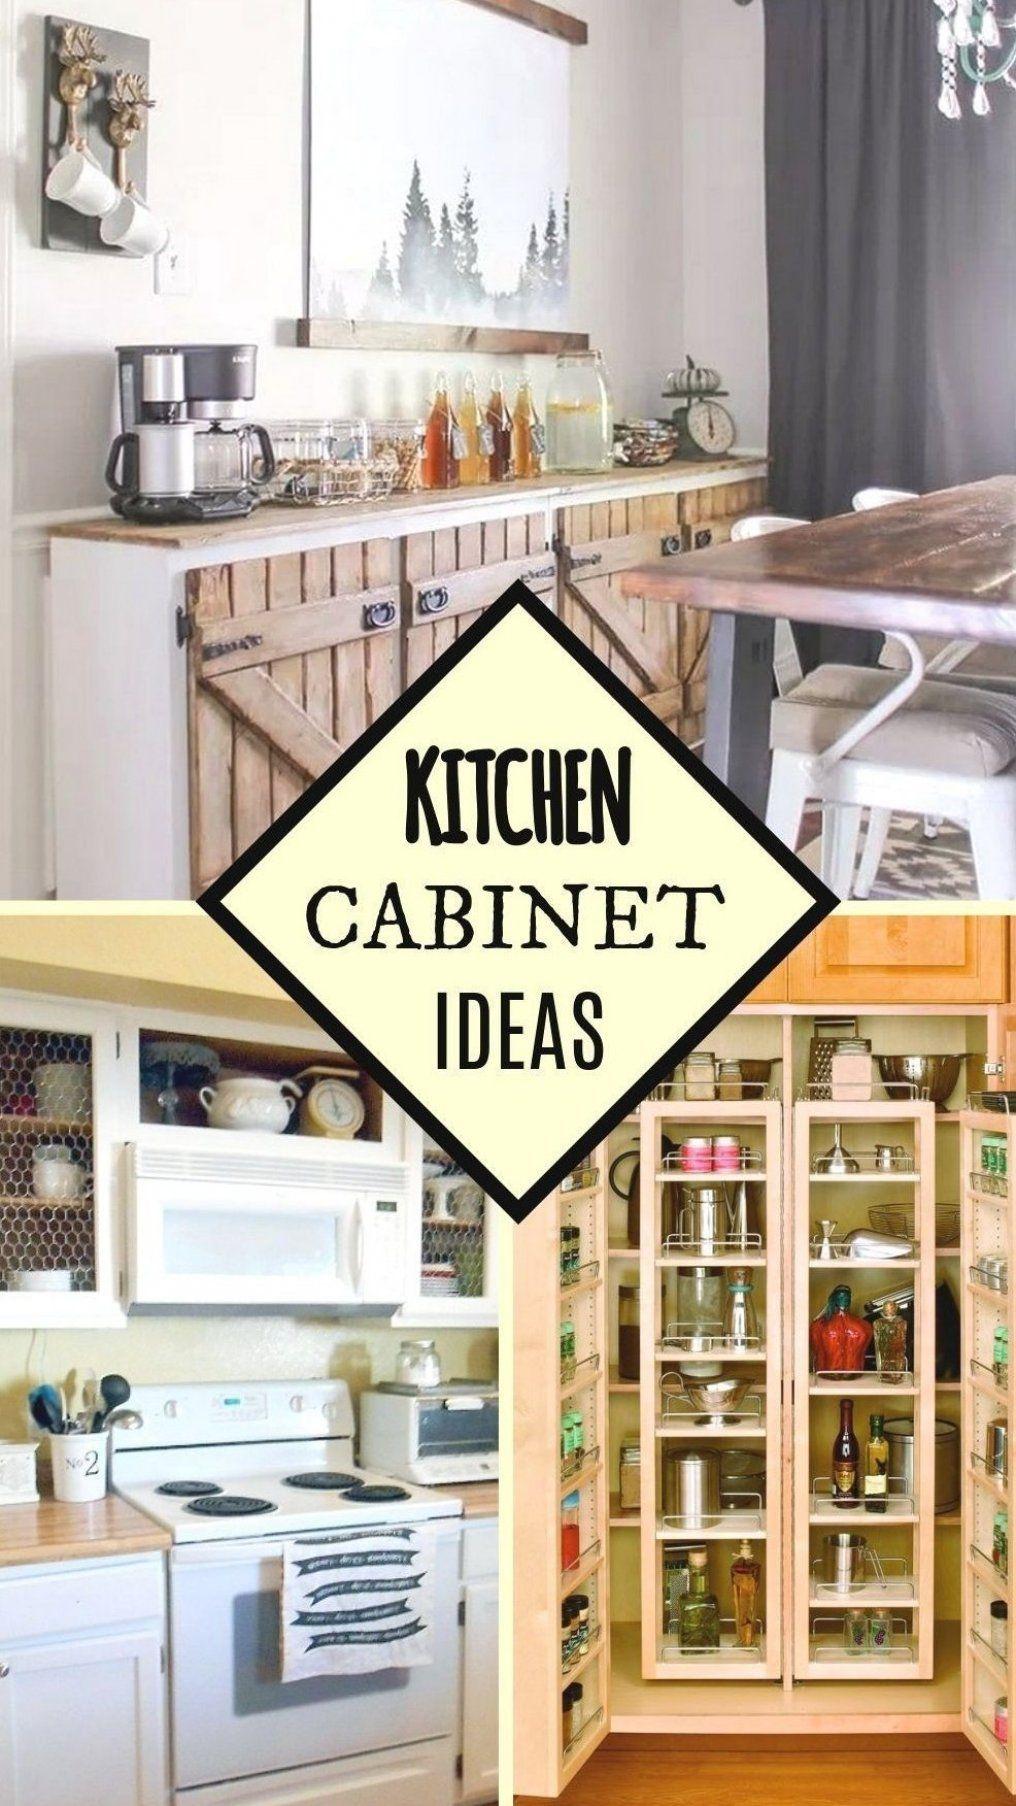 Kitchen Decor With Coffee Theme Modern Farmhouse Italian Ideas For Countr Backsplash Designs Diy New